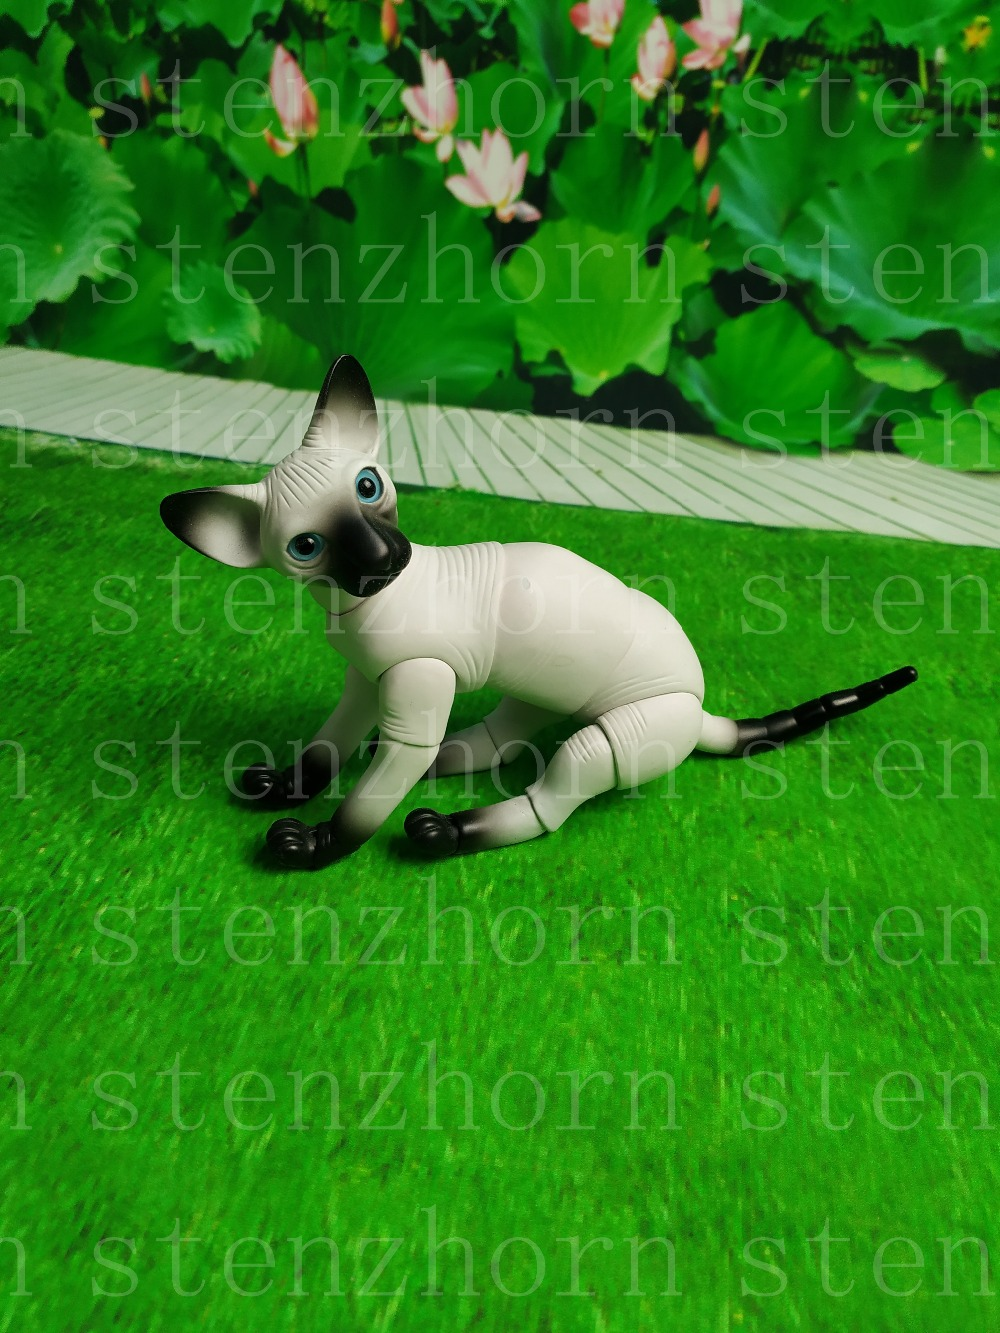 Stenzhorn  New Bjd Doll - Hairless Cat Animal Toy Fashion Doll Free Eyes